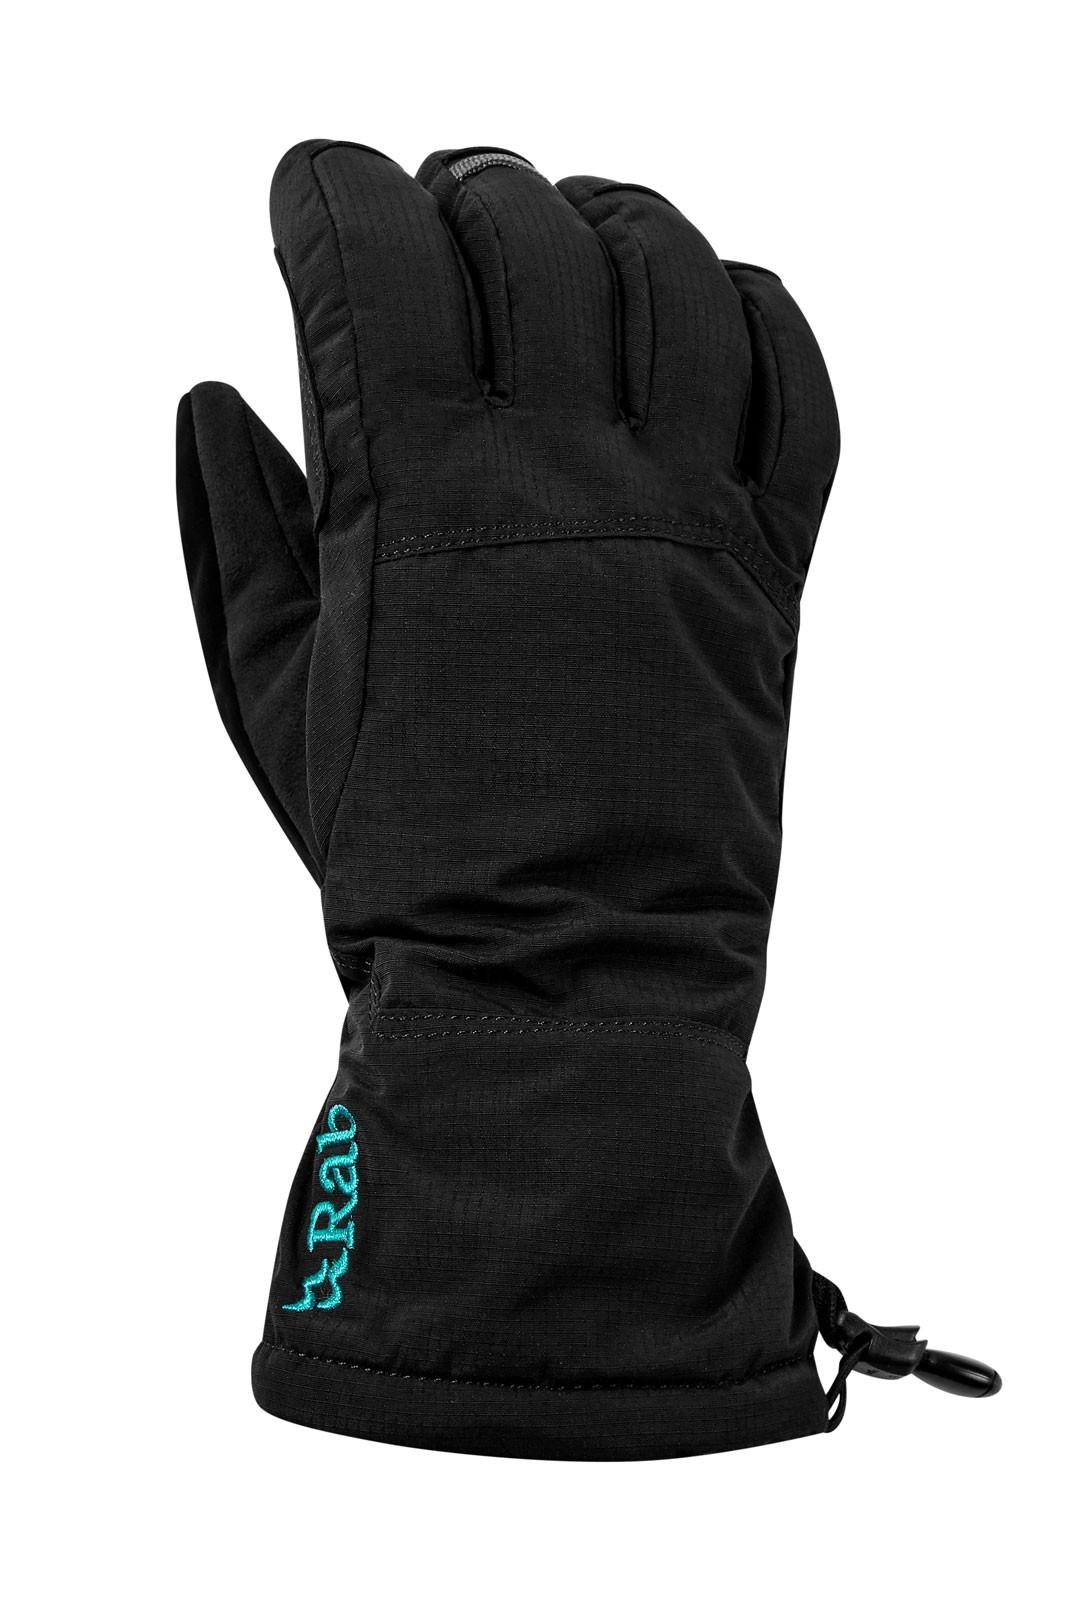 RAB Storm Glove W's, Black